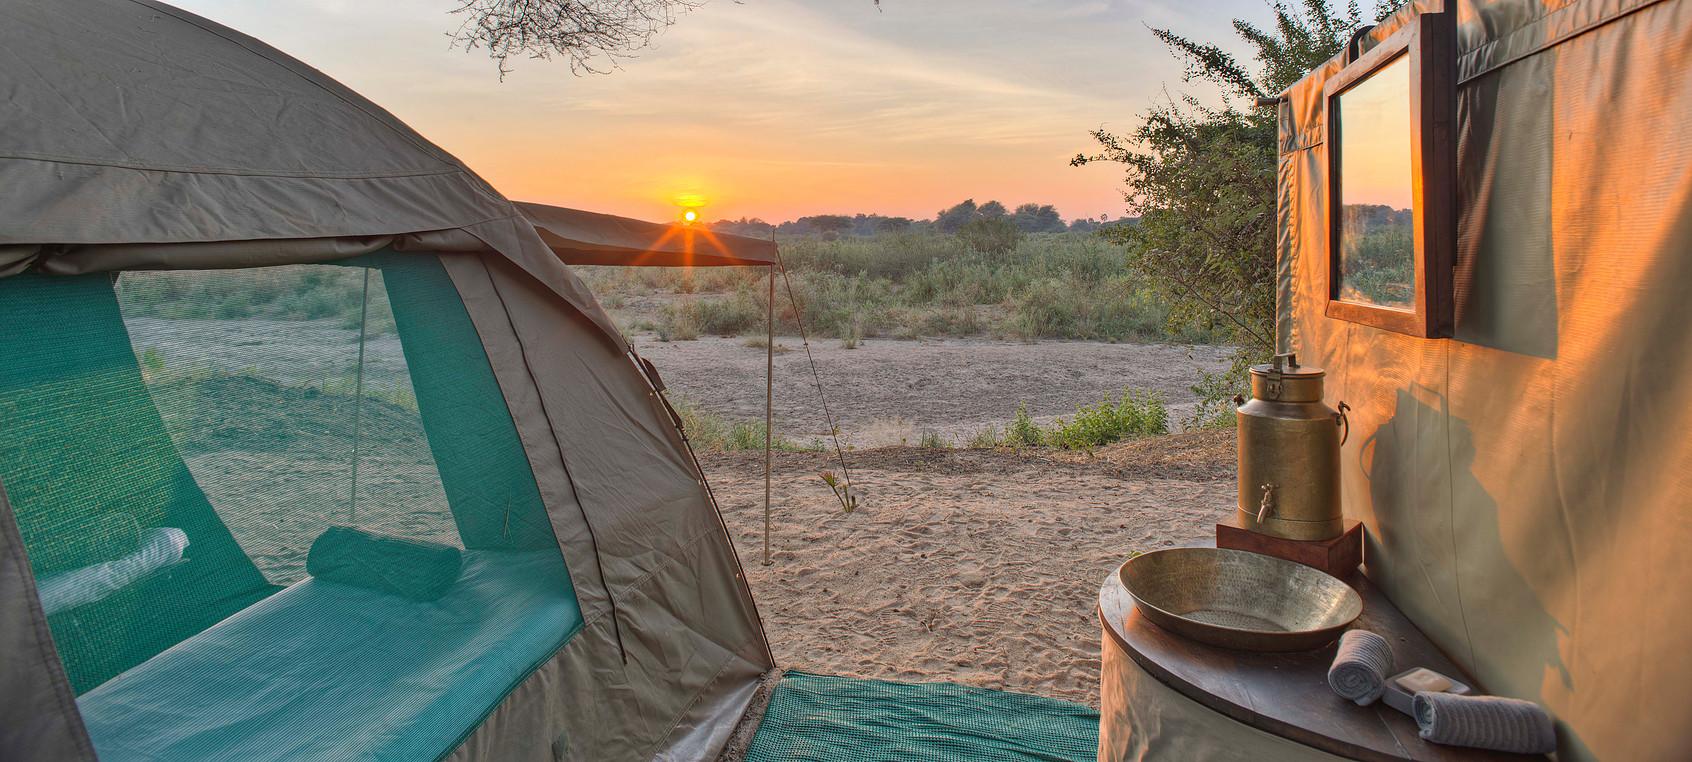 Safari à pied à Ruaha - vue tente Kichaka Expeditions